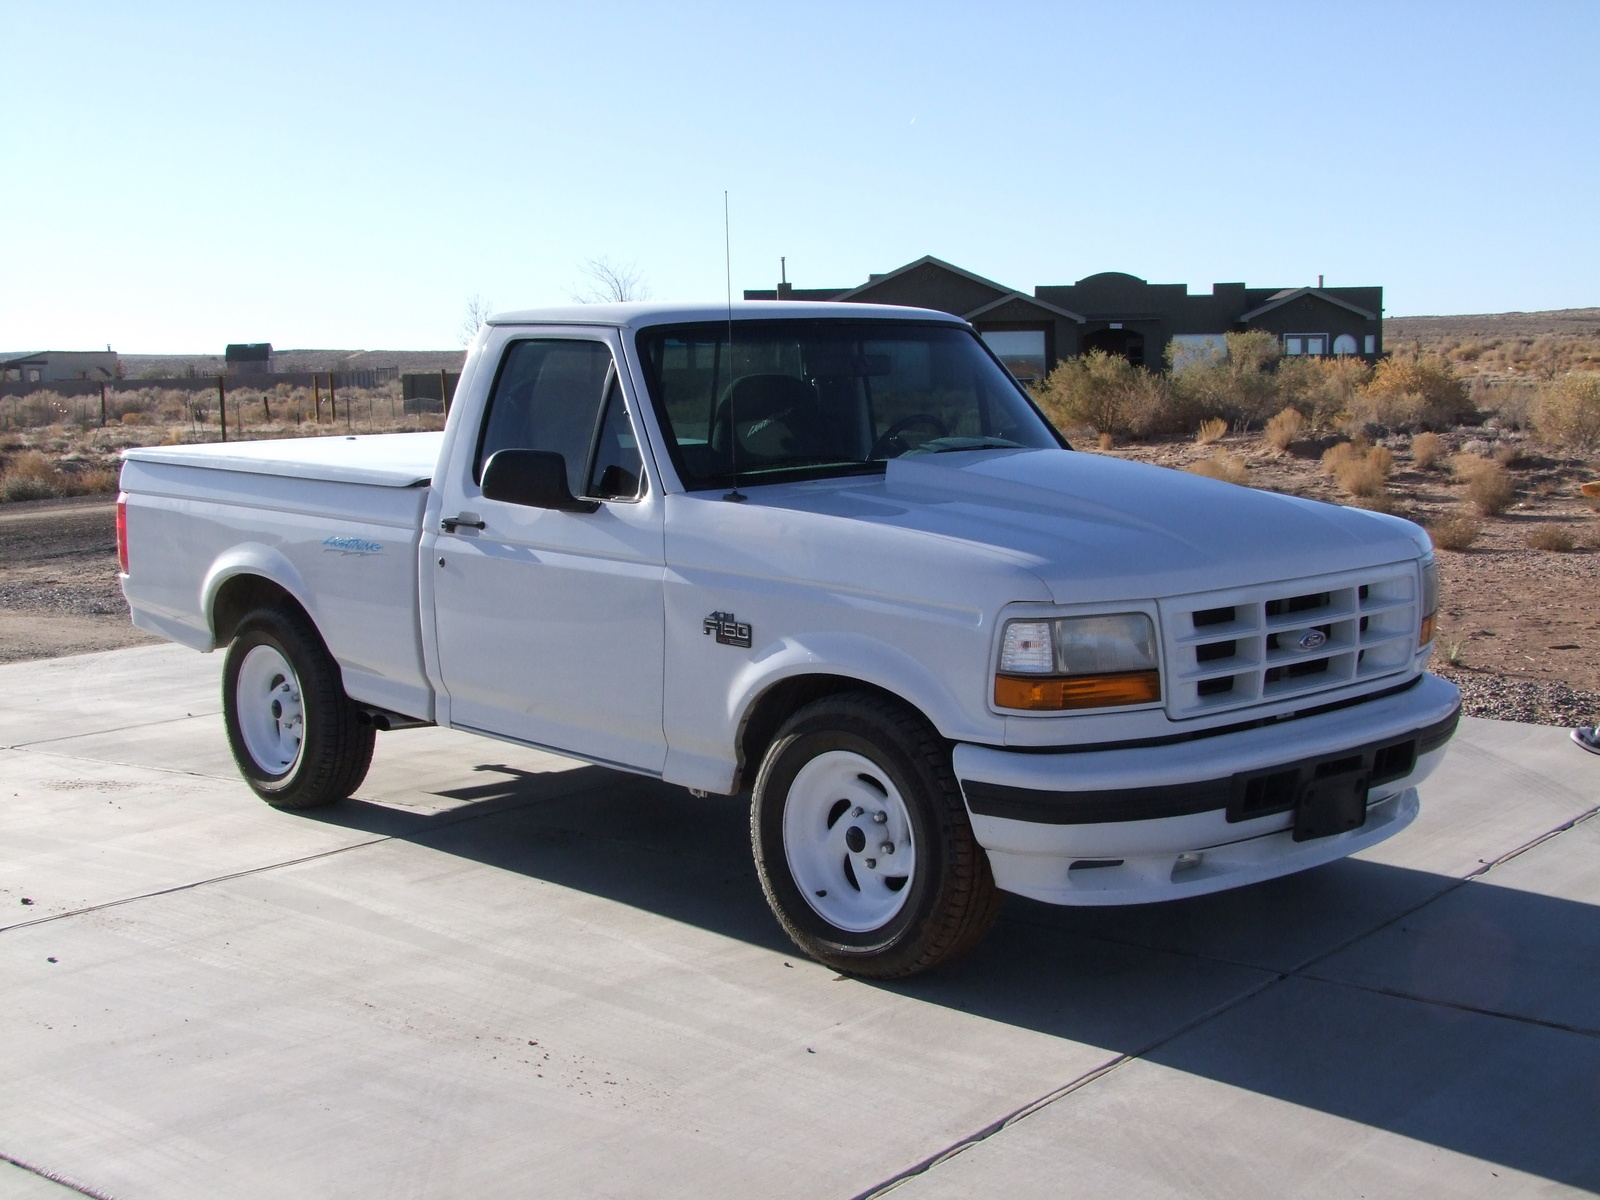 Badass Trucks & Cool SUVs - Ford lightning